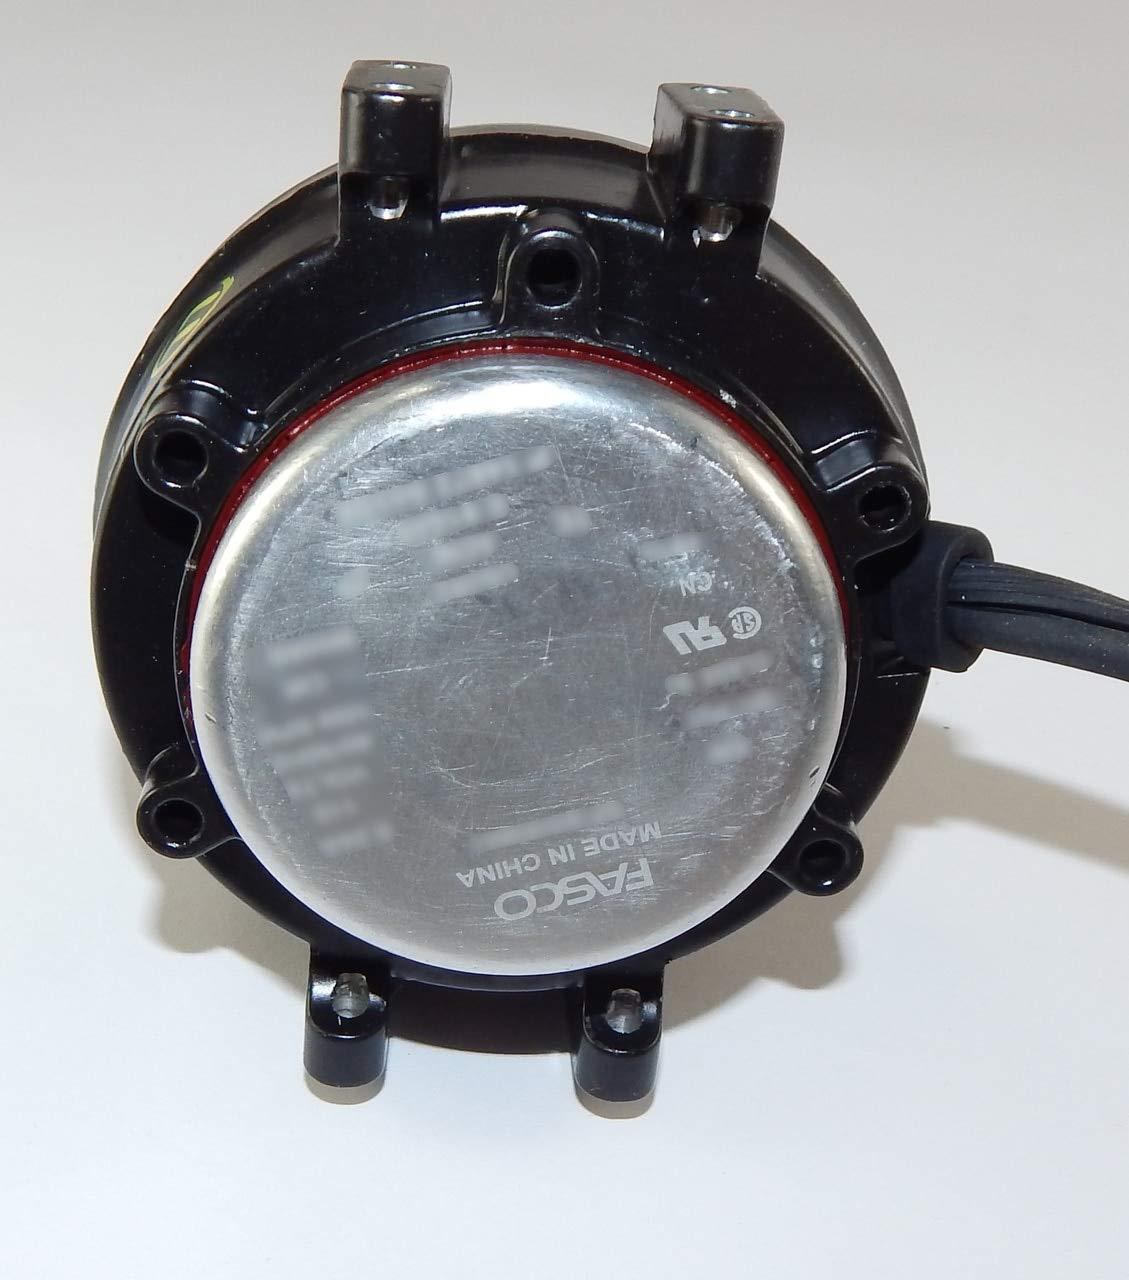 9 Watt 1550 RPM CWLE 230V Unit Bearing Refrigeration Fasco Electric Motor # UB564 by Fasco (Image #1)